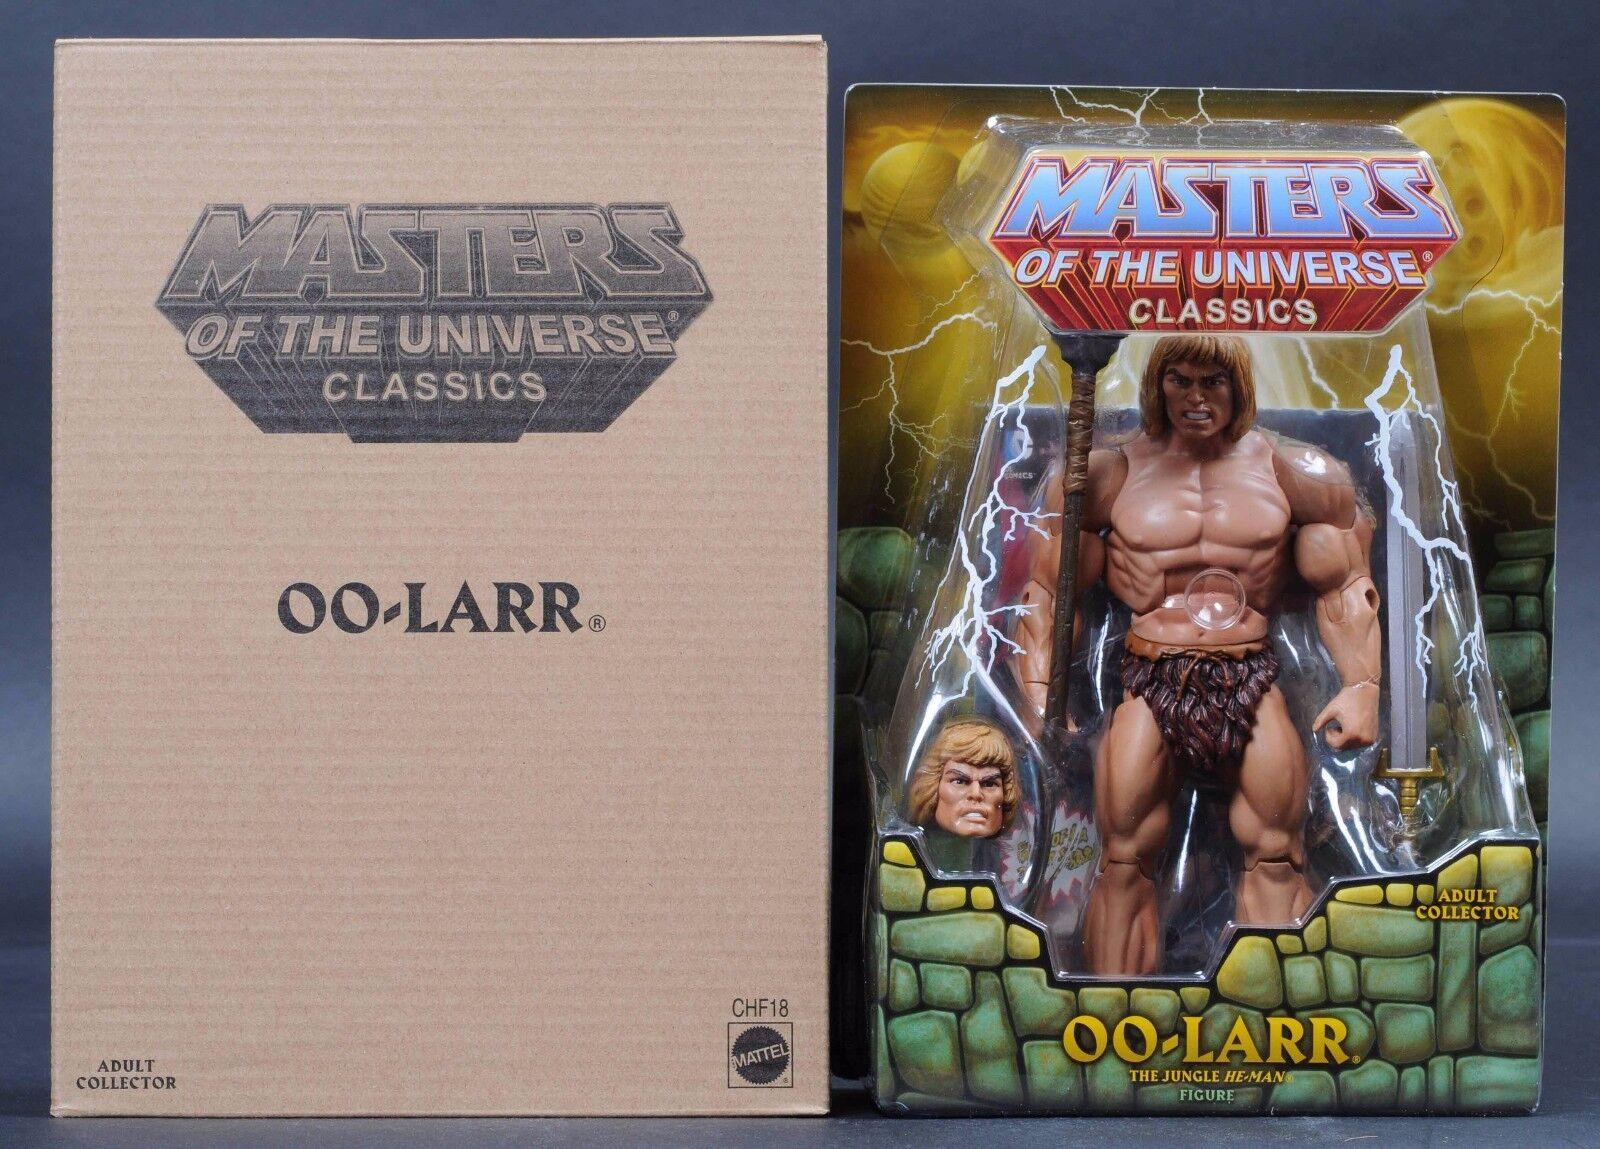 2015 Mattel MOTU MOTU MOTU Oo-Larr MOTUC Masters of the Universe classeics MOC 874dd8